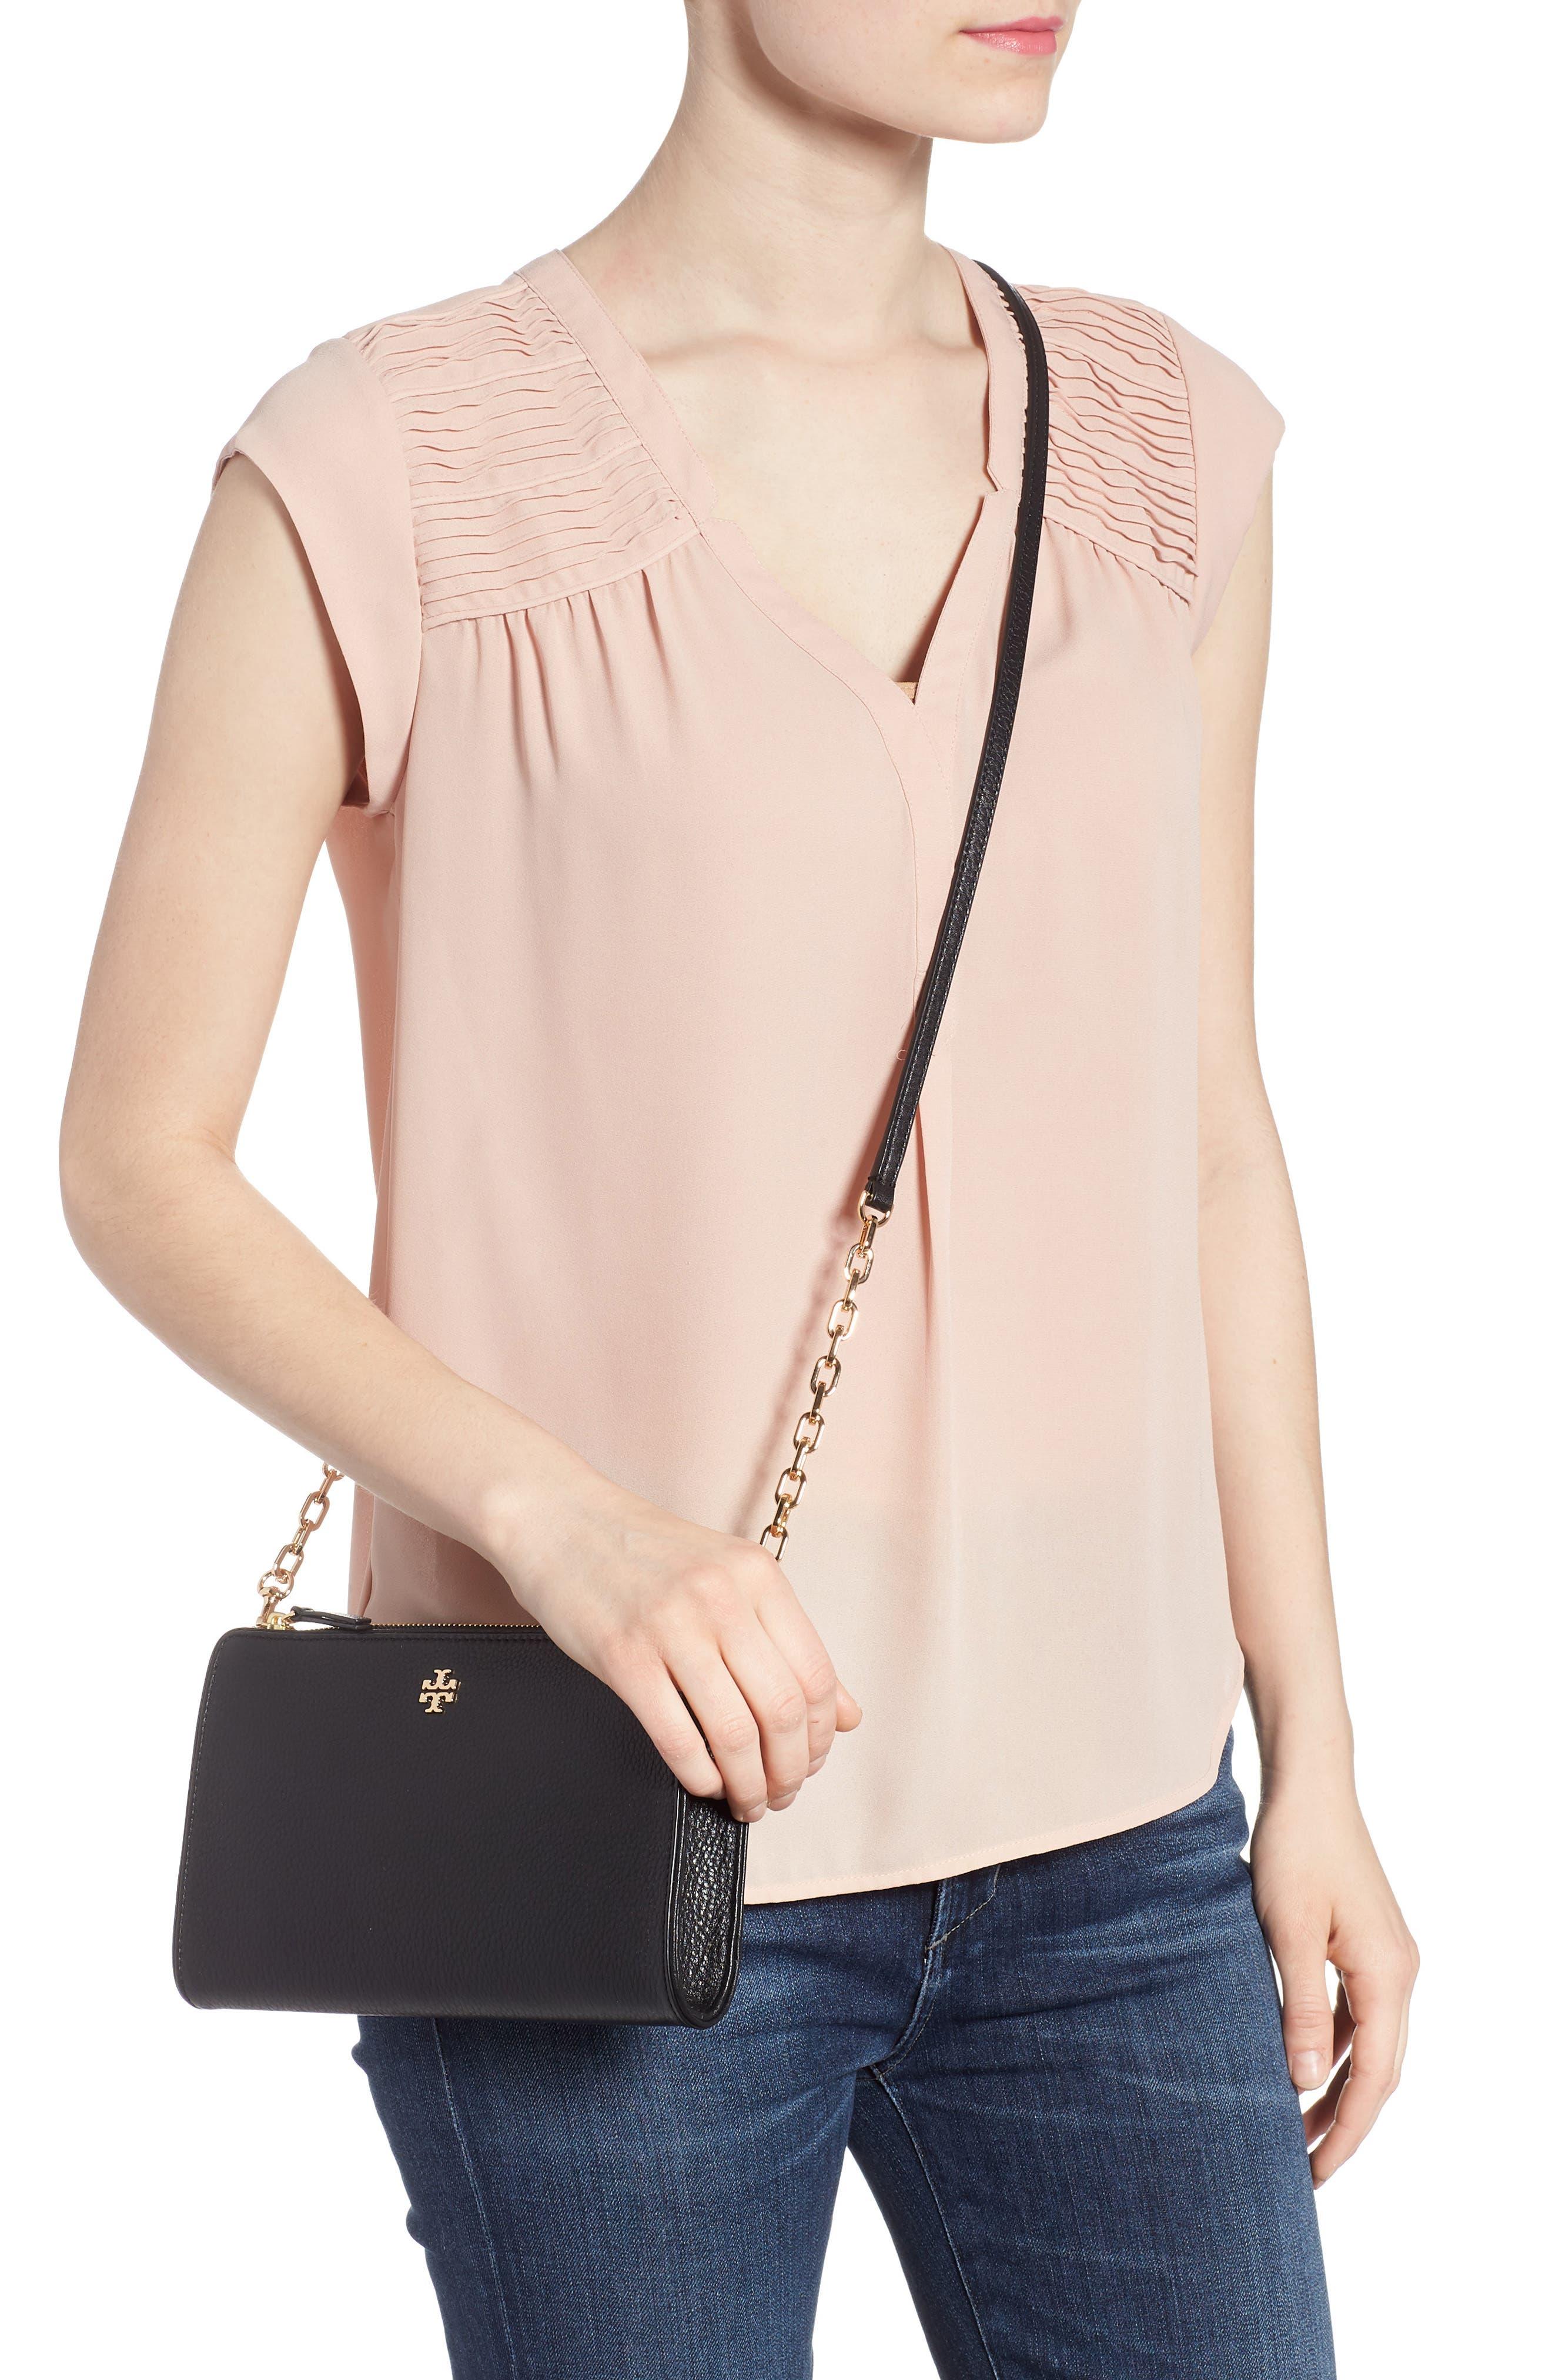 Marsden Leather Wallet Crossbody Bag,                             Alternate thumbnail 2, color,                             Black